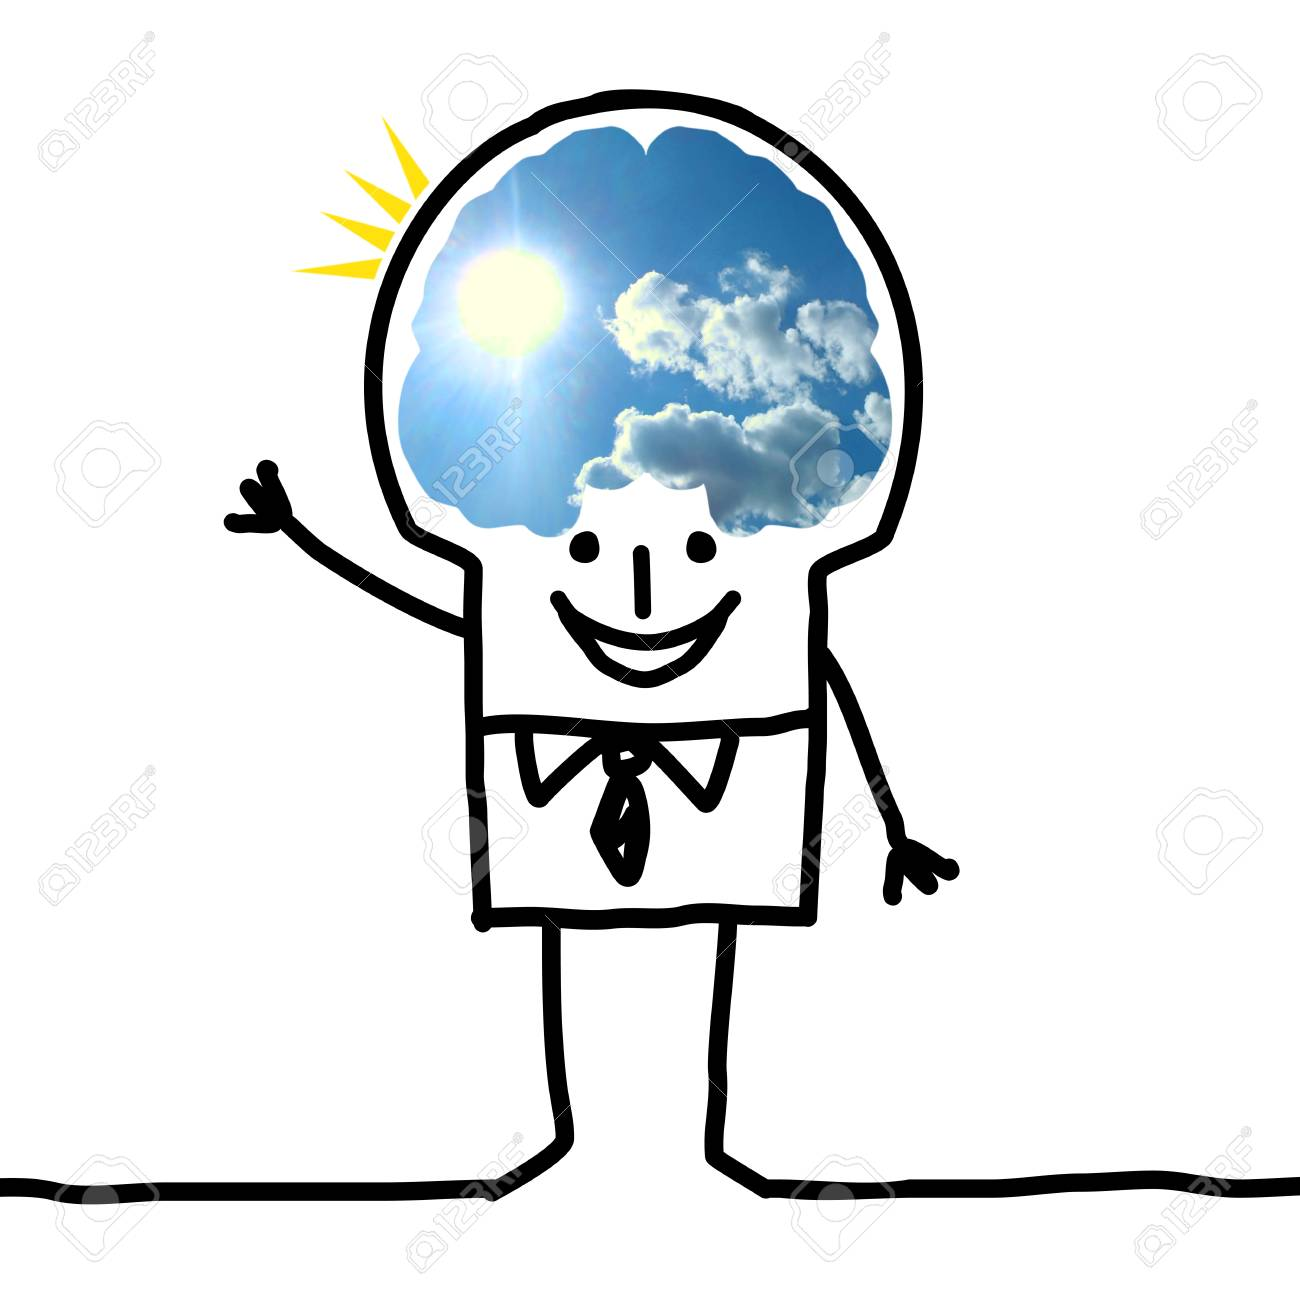 Cartoon big brain man blue sky and optimism stock photo picture cartoon big brain man blue sky and optimism stock photo 73832353 thecheapjerseys Gallery